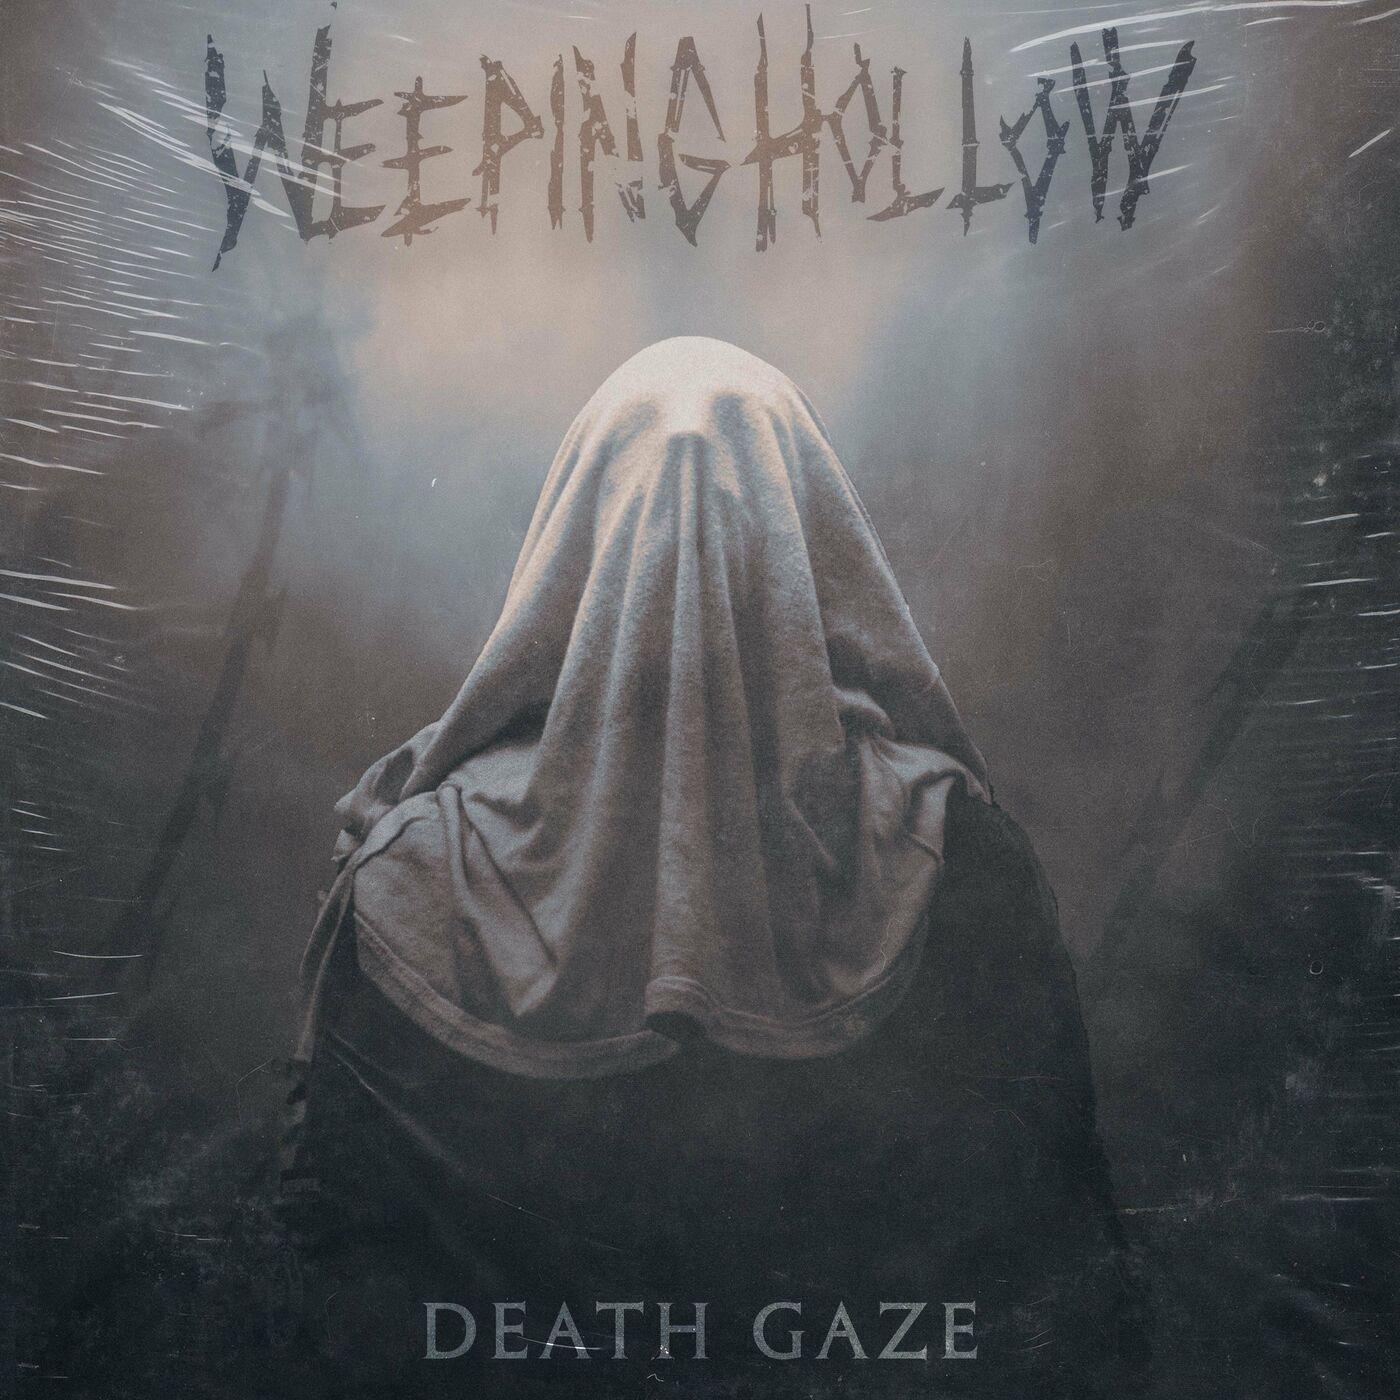 Weeping Hollow - Death Gaze [EP] (2021)